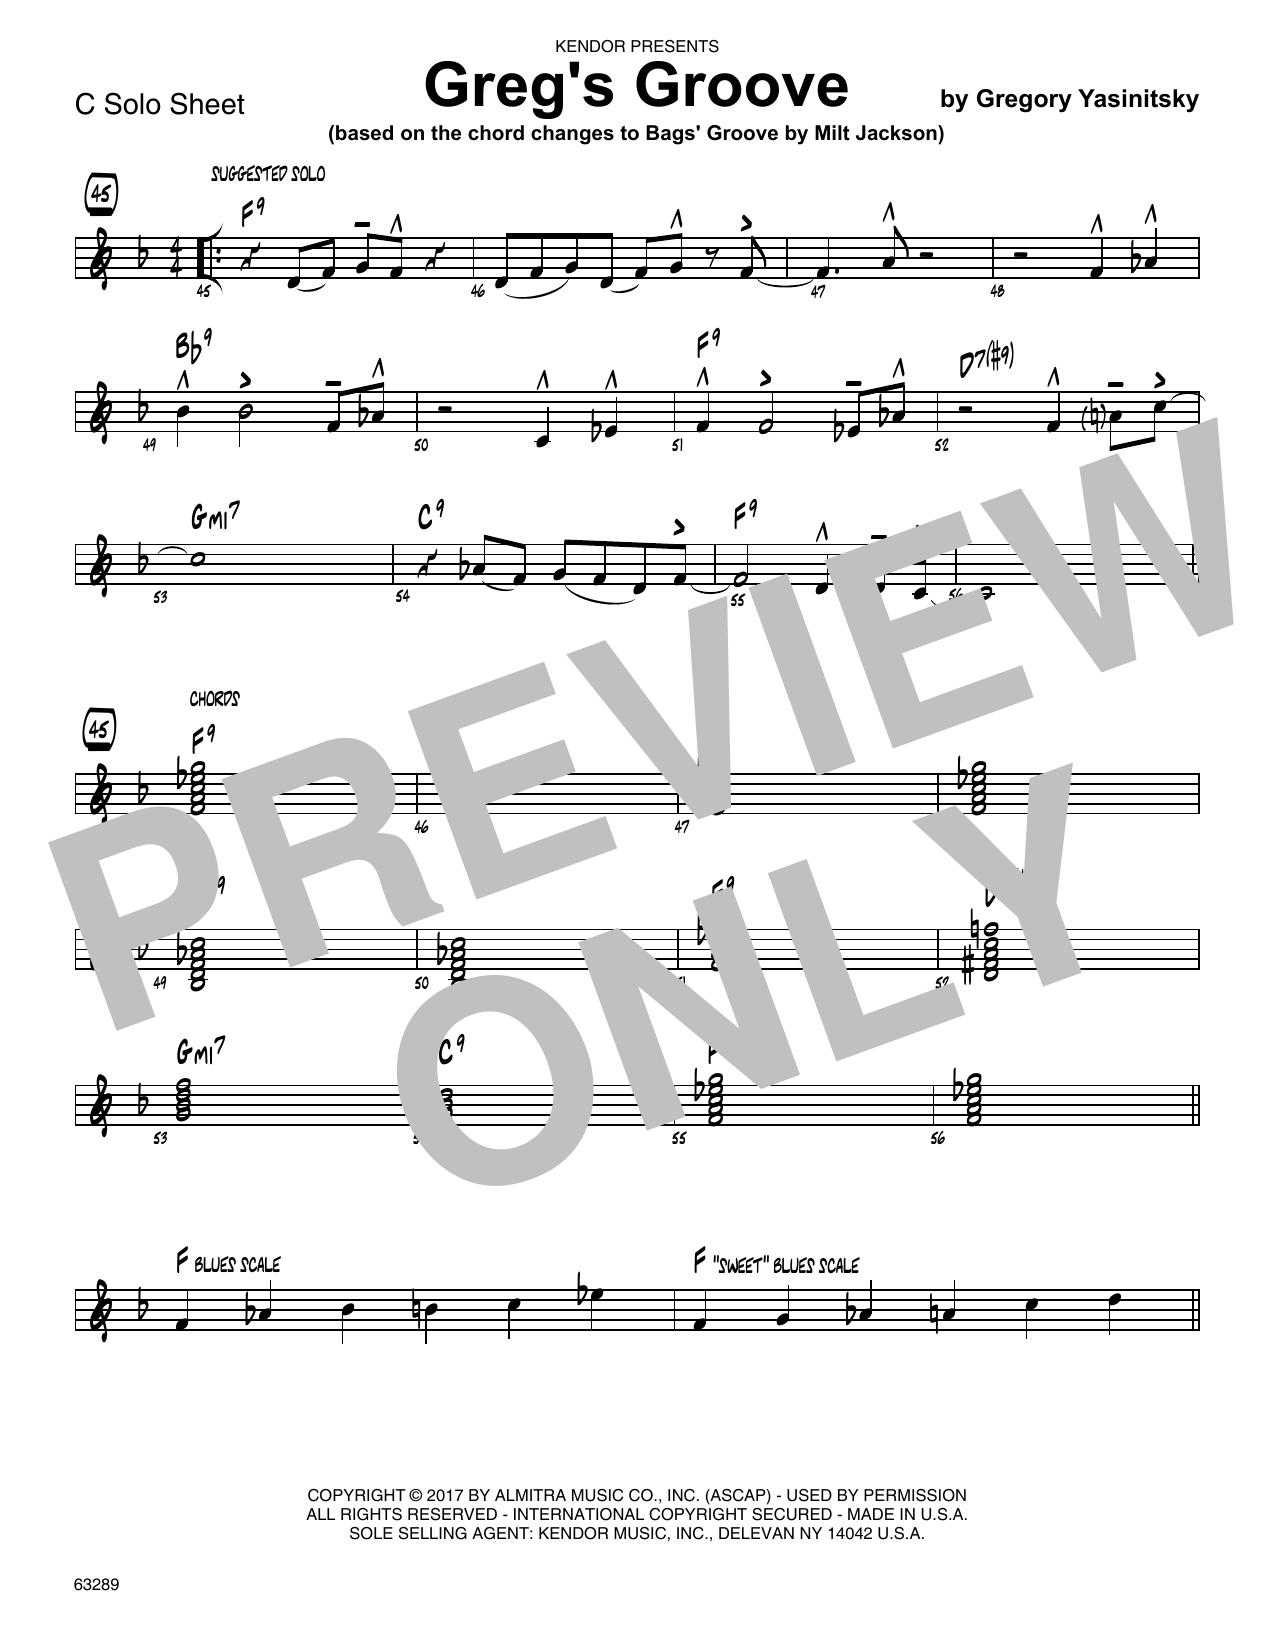 Greg's Groove - Solo Sheet - Trumpet Partition Digitale